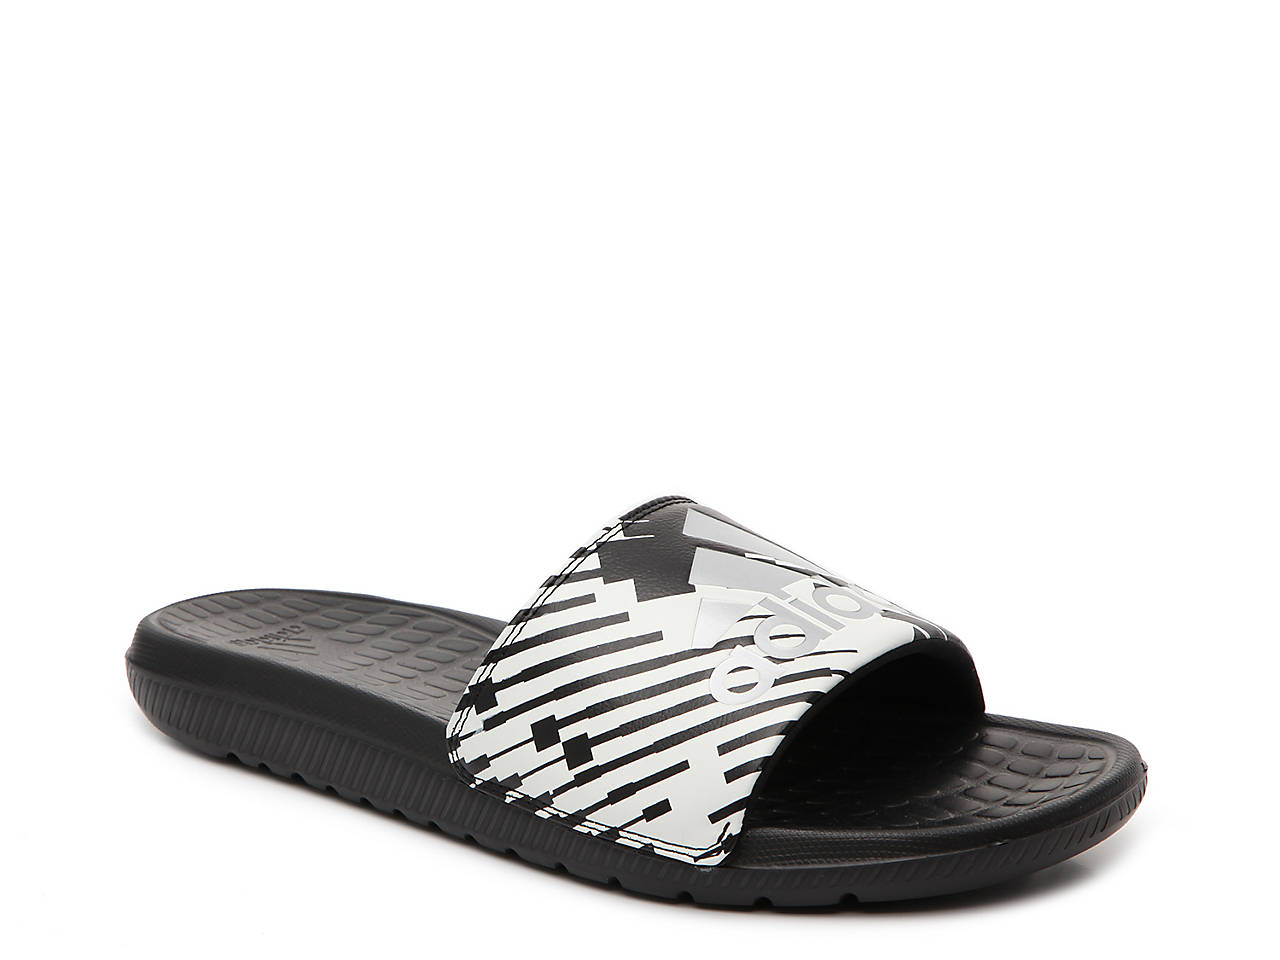 29987bba5eb341 adidas Voloomix GR Slide Sandal - Men s Men s Shoes